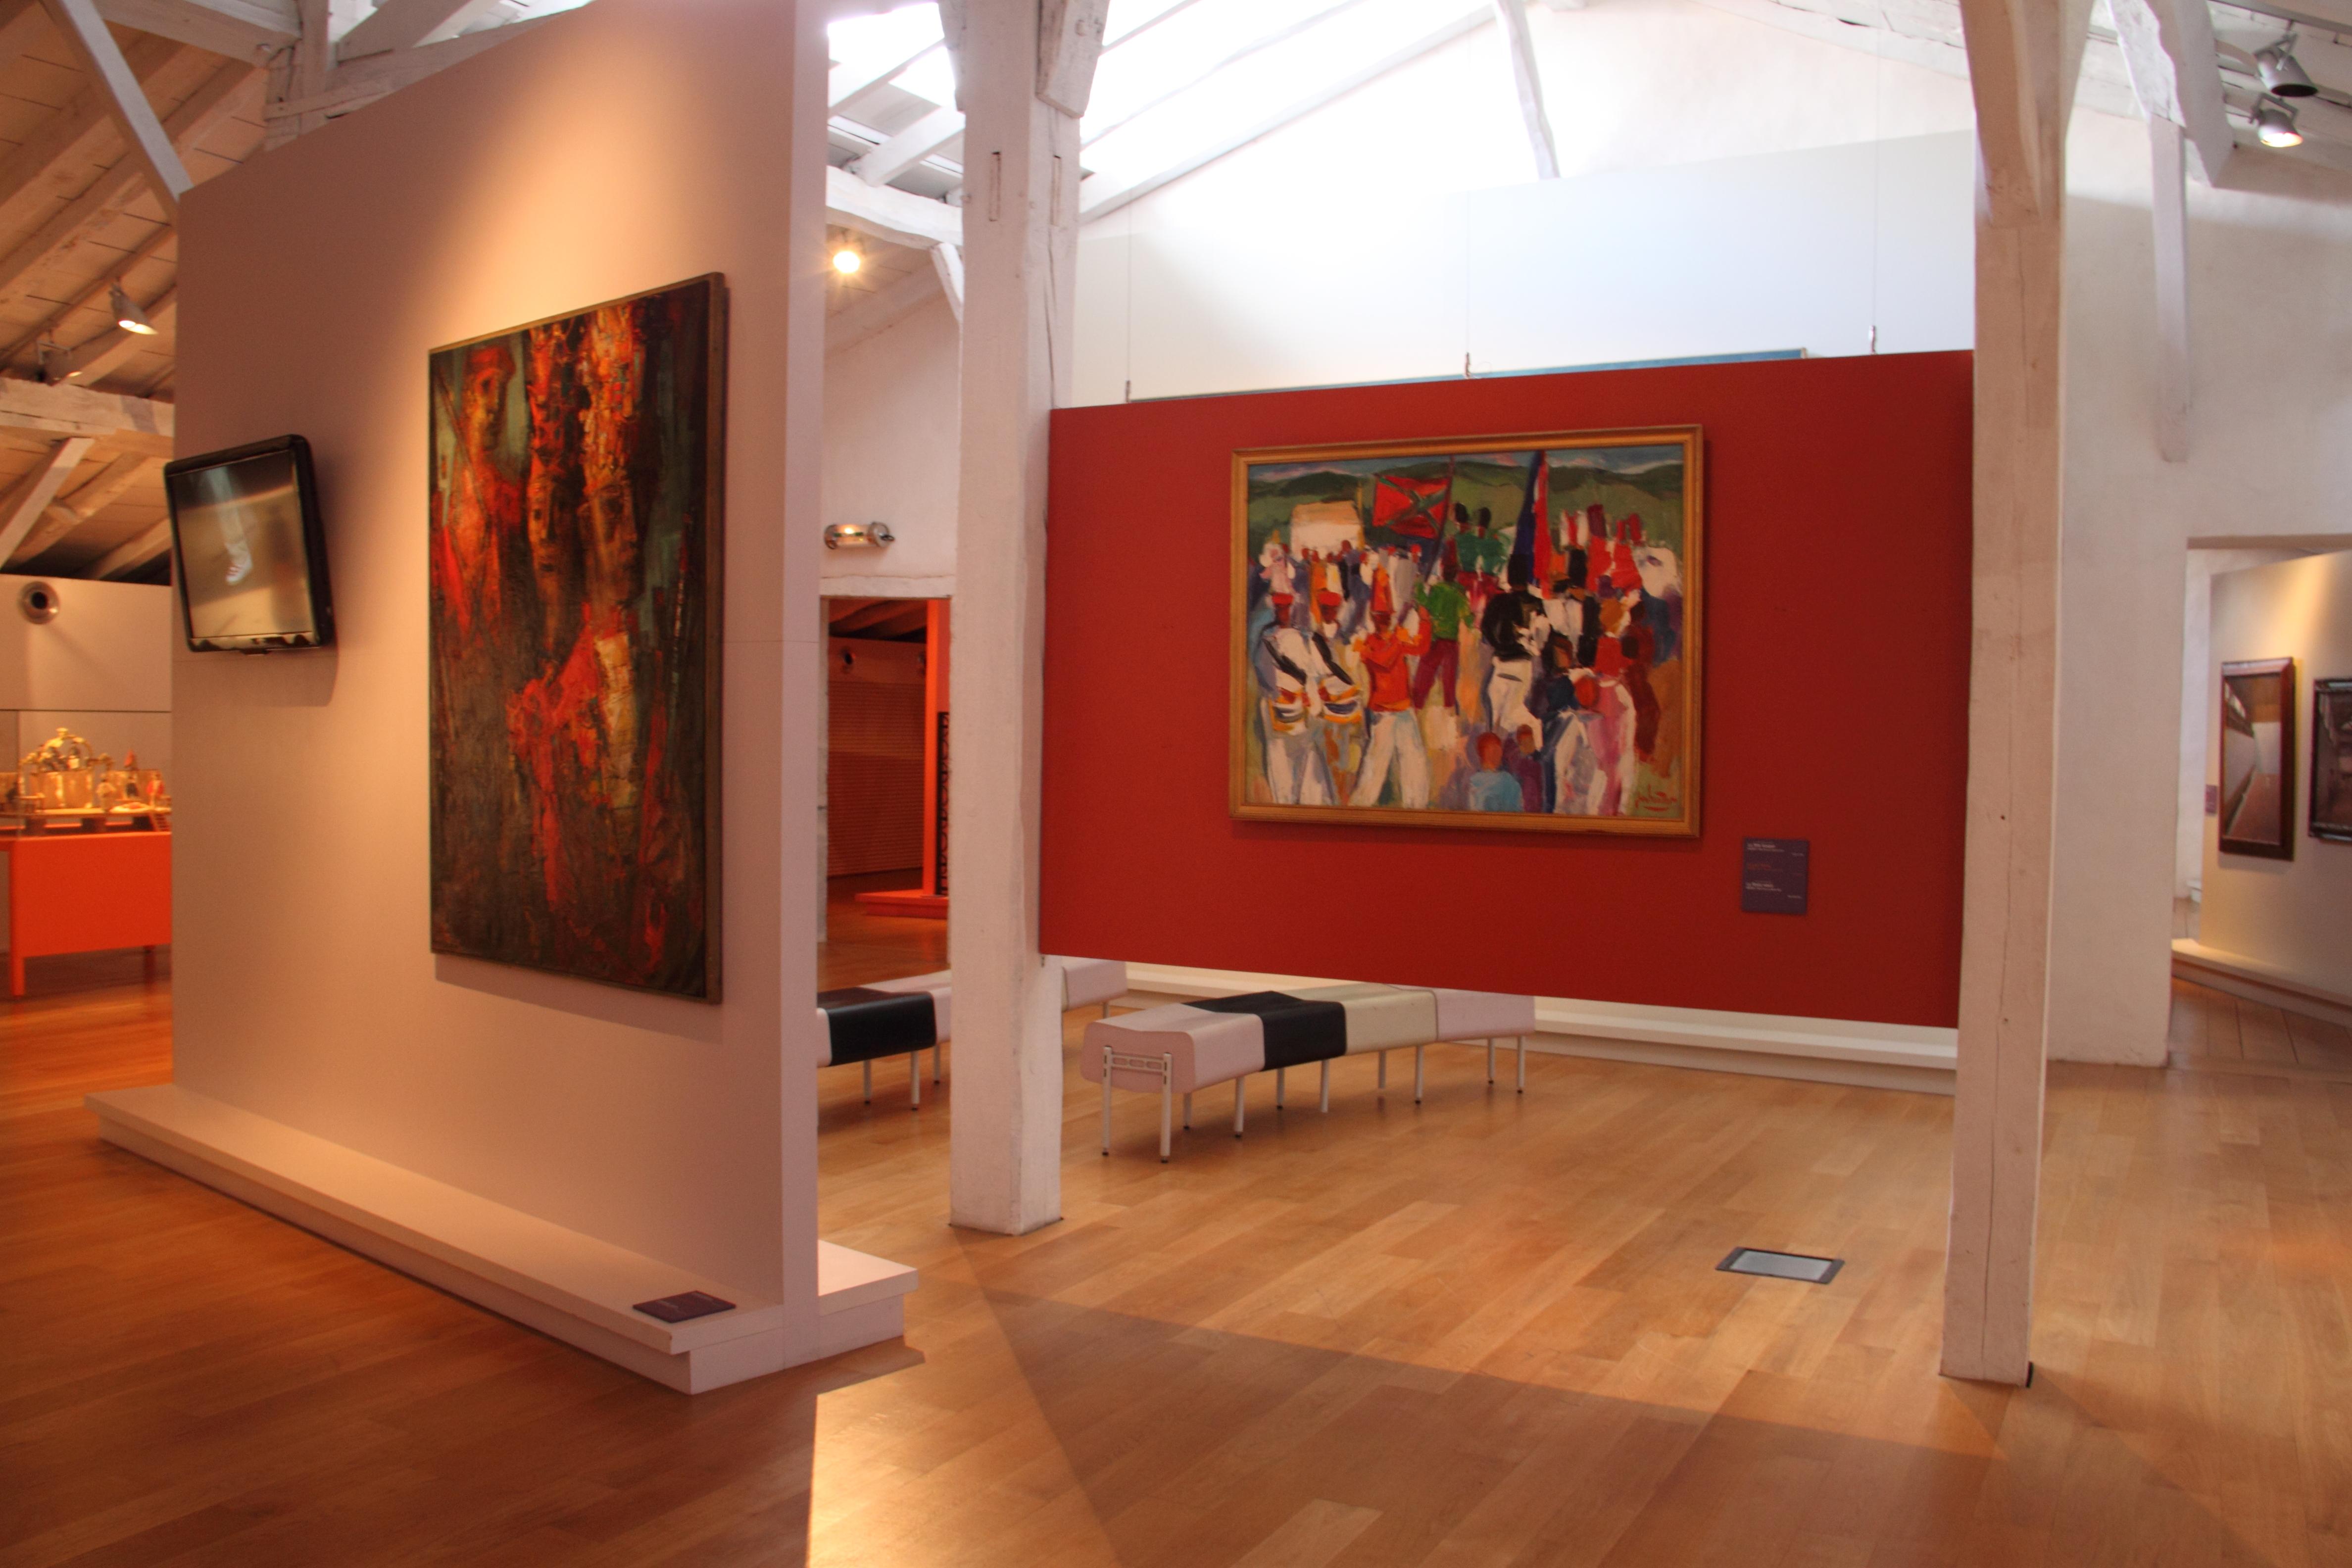 Art history 2011 - 2 part 7